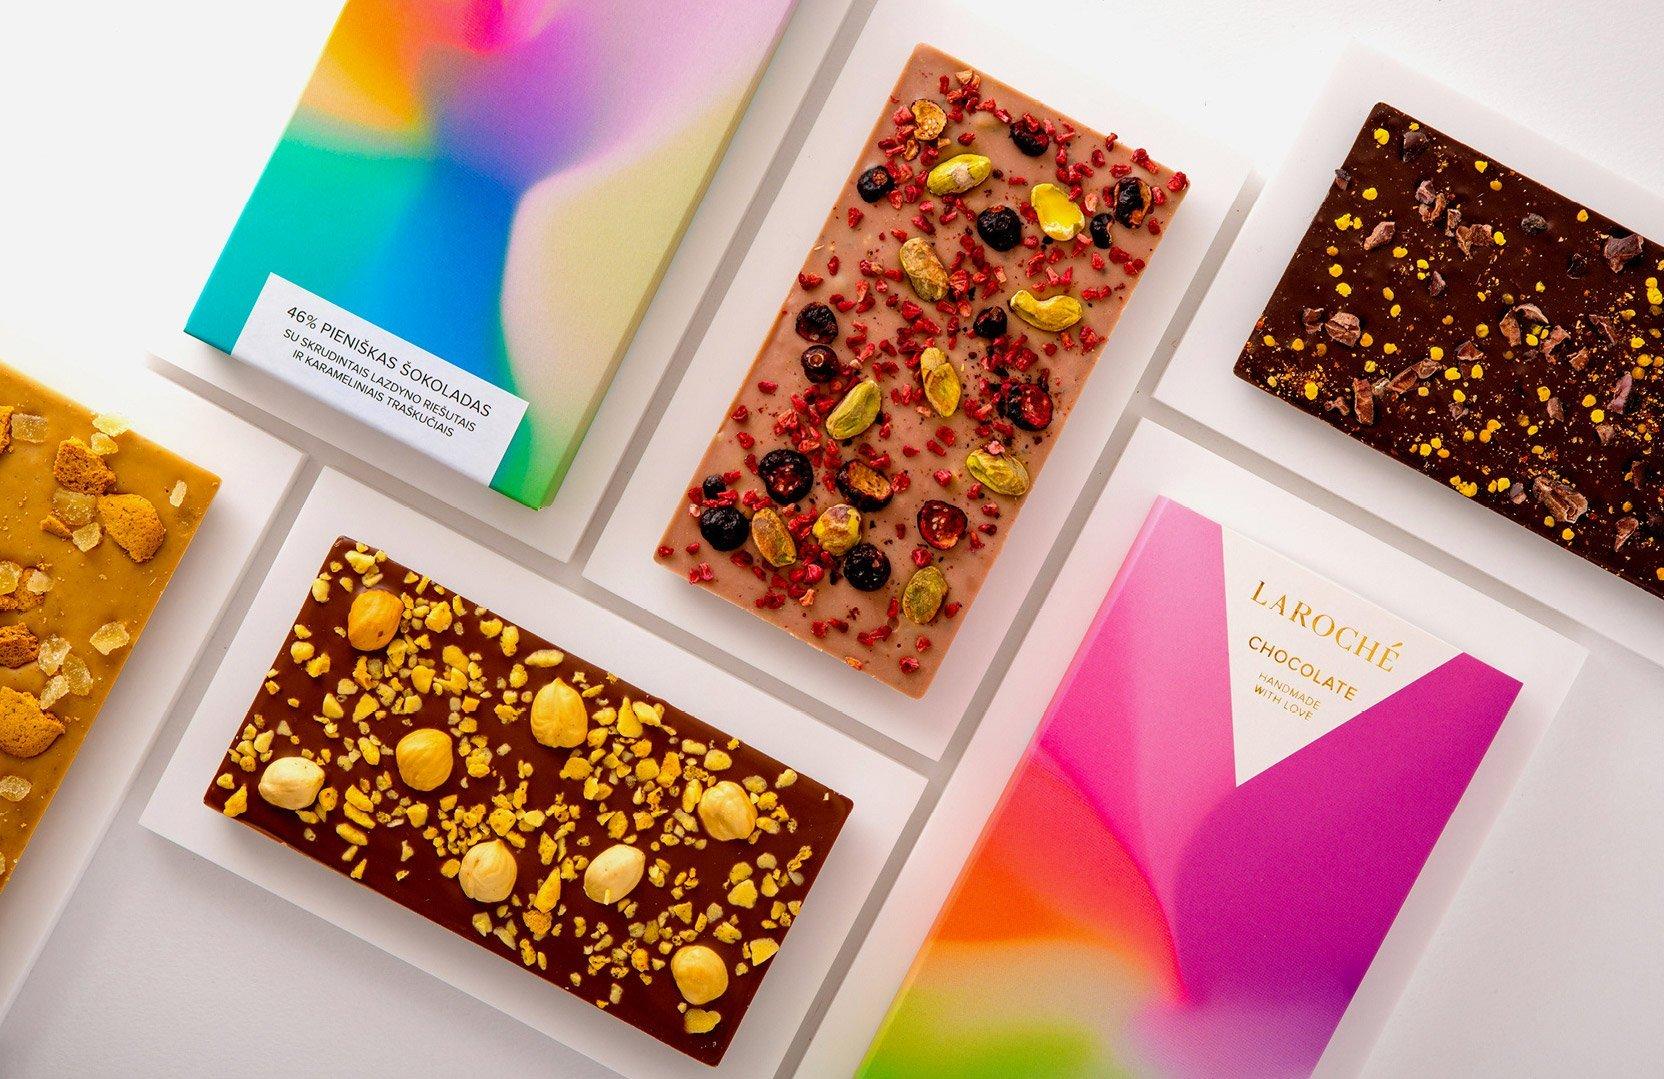 Laroche-Chocolate-Packaging-by-Martin-Naumann-09